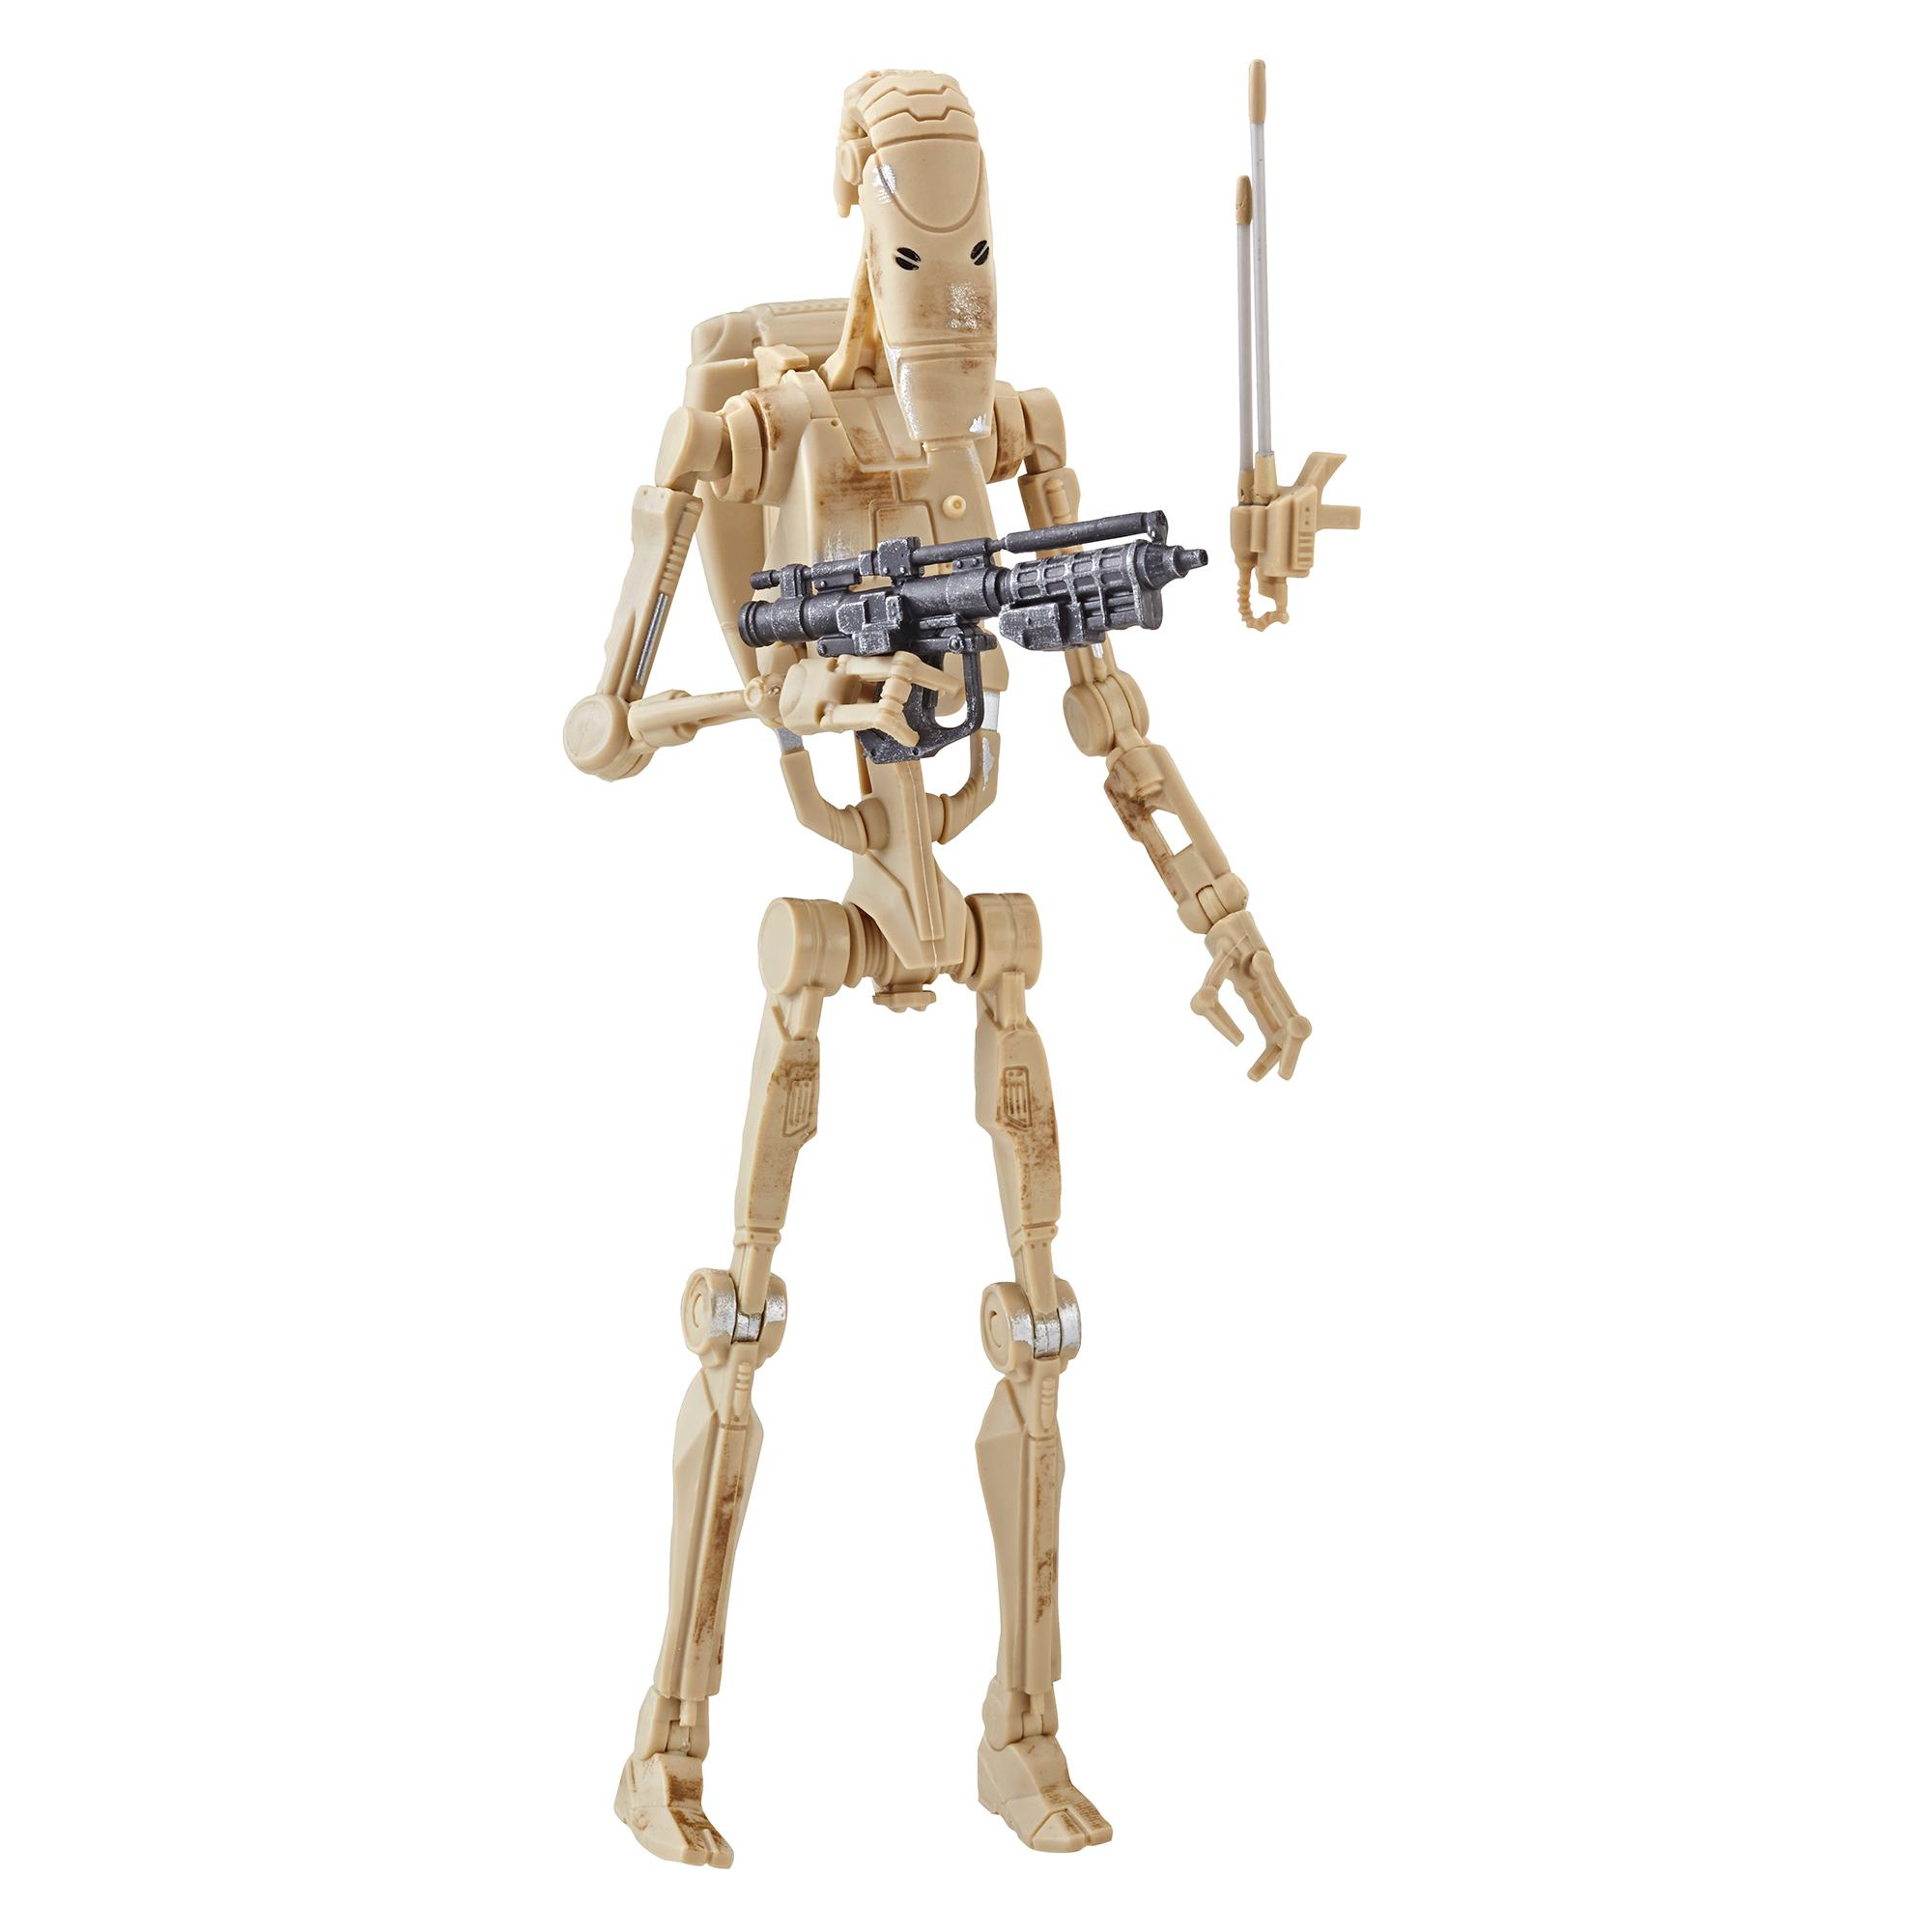 Star Wars The Black Series 6-inch Battle Droid Figure